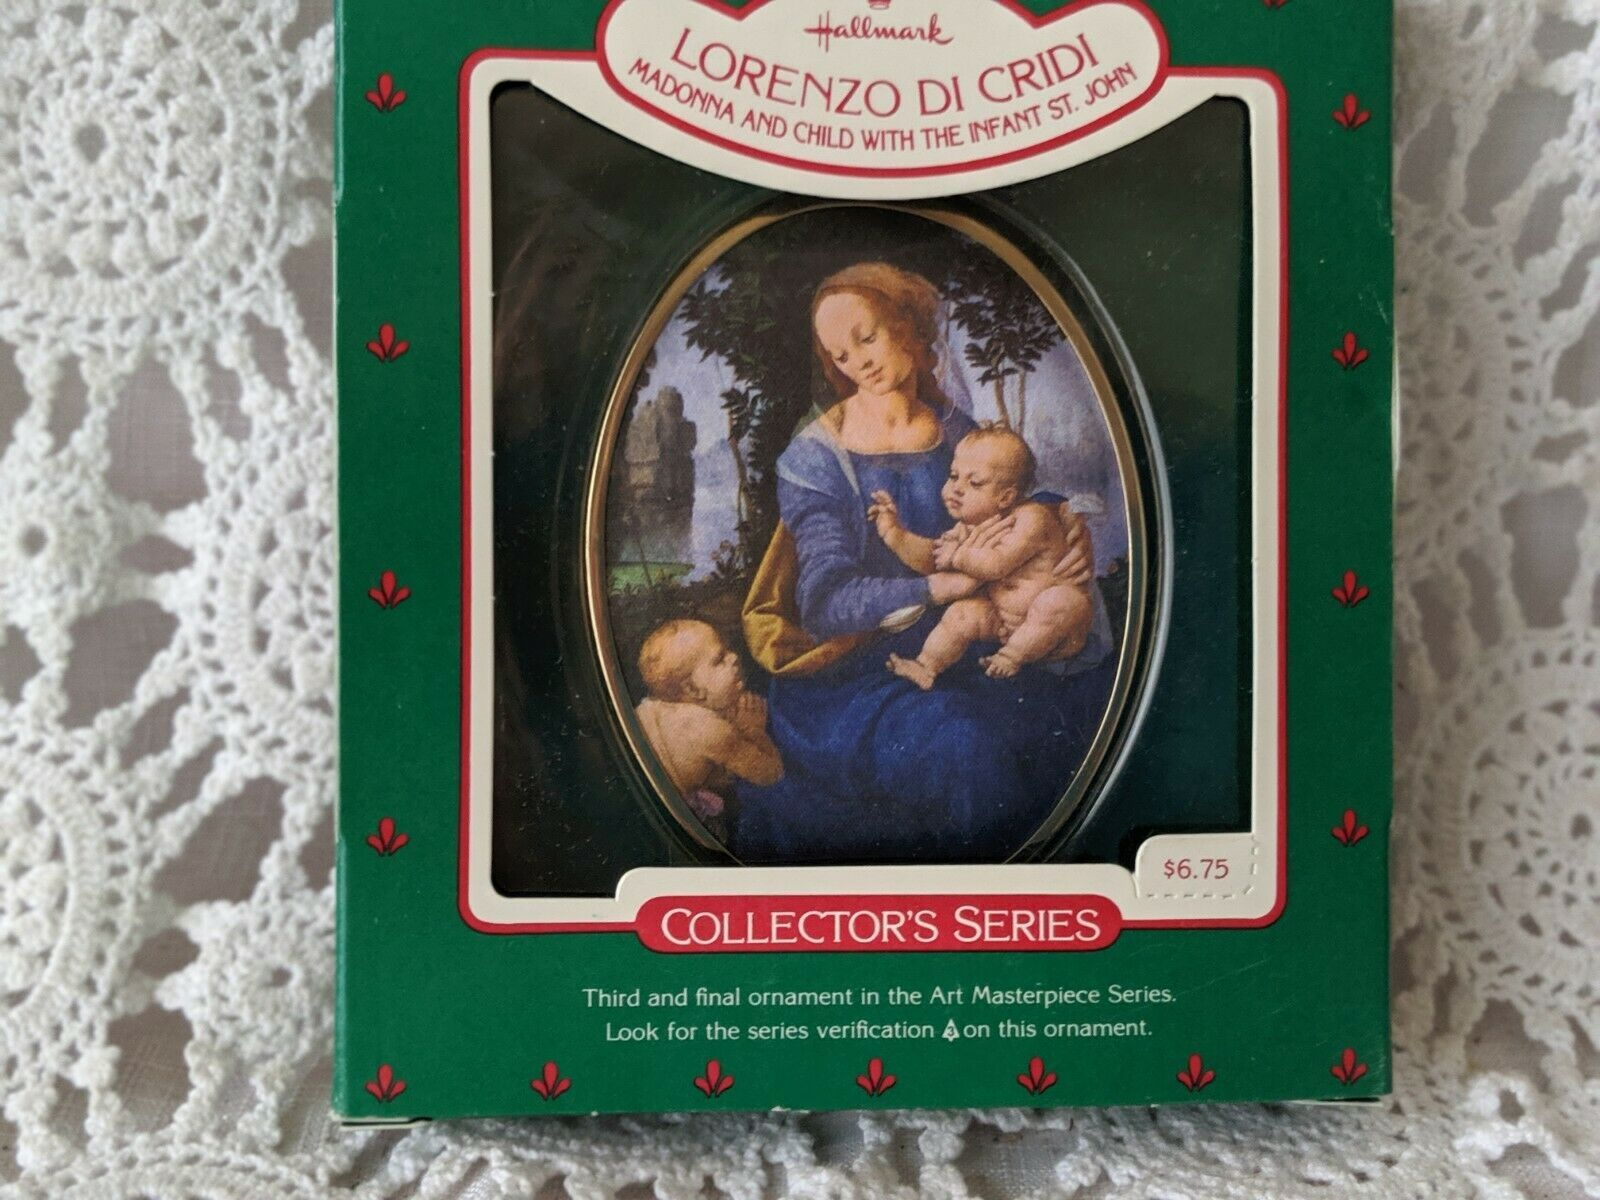 Hallmark Lorenzo Di Cridi Madonna and Child with the Infant St.John Ornament. image 2